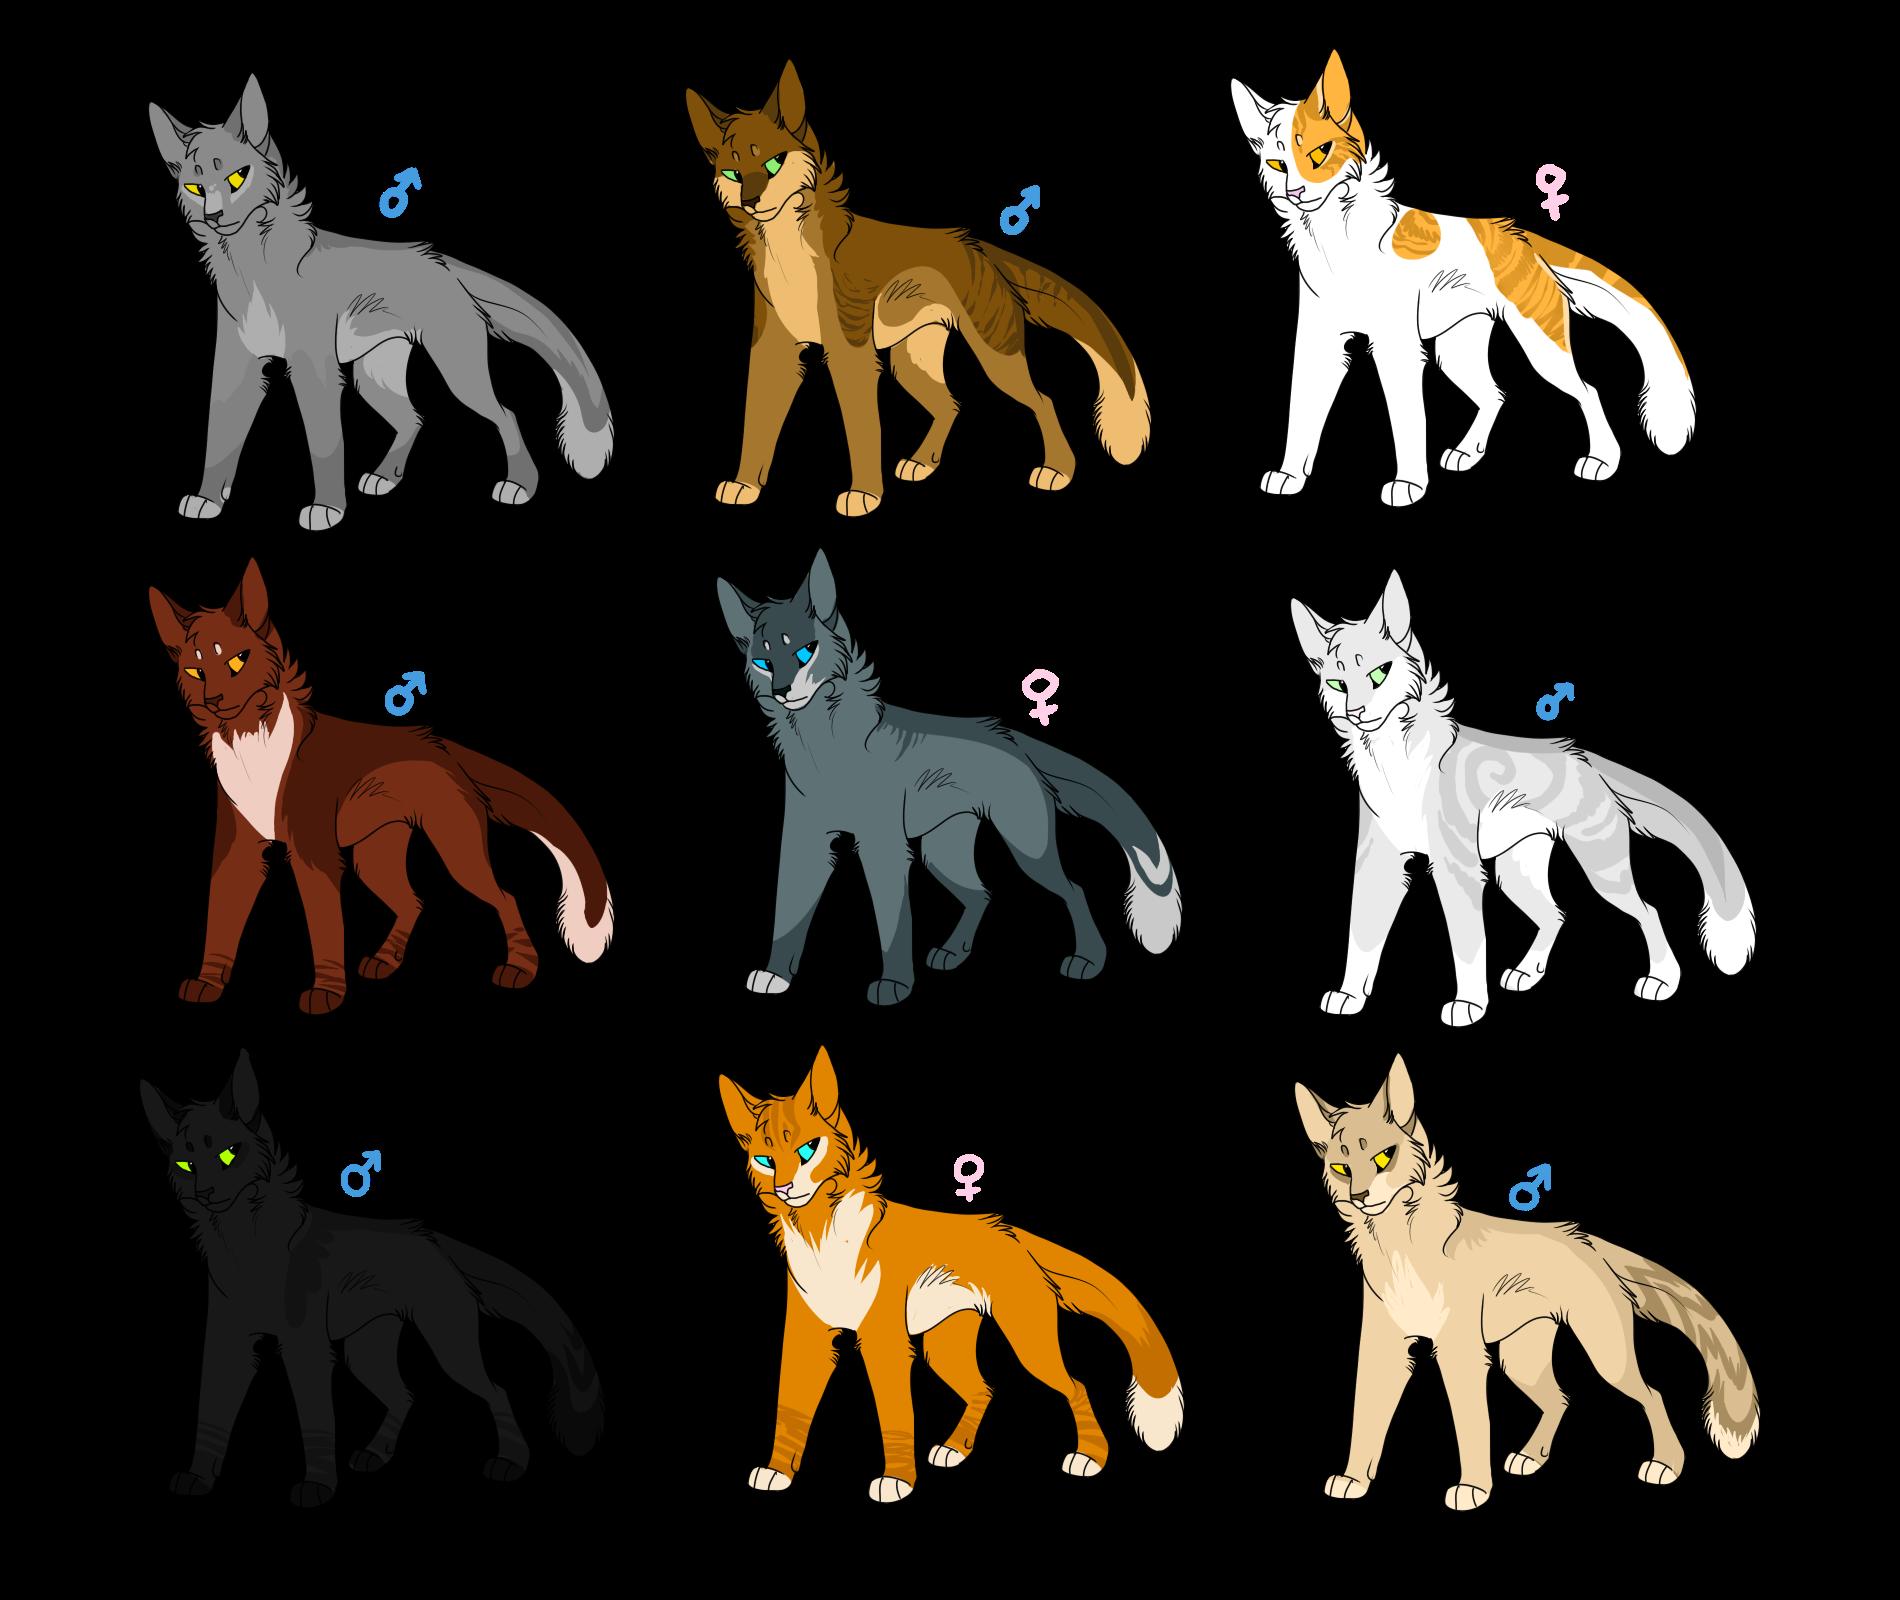 warrior cats Google Search Warrior cats, Warrior cats